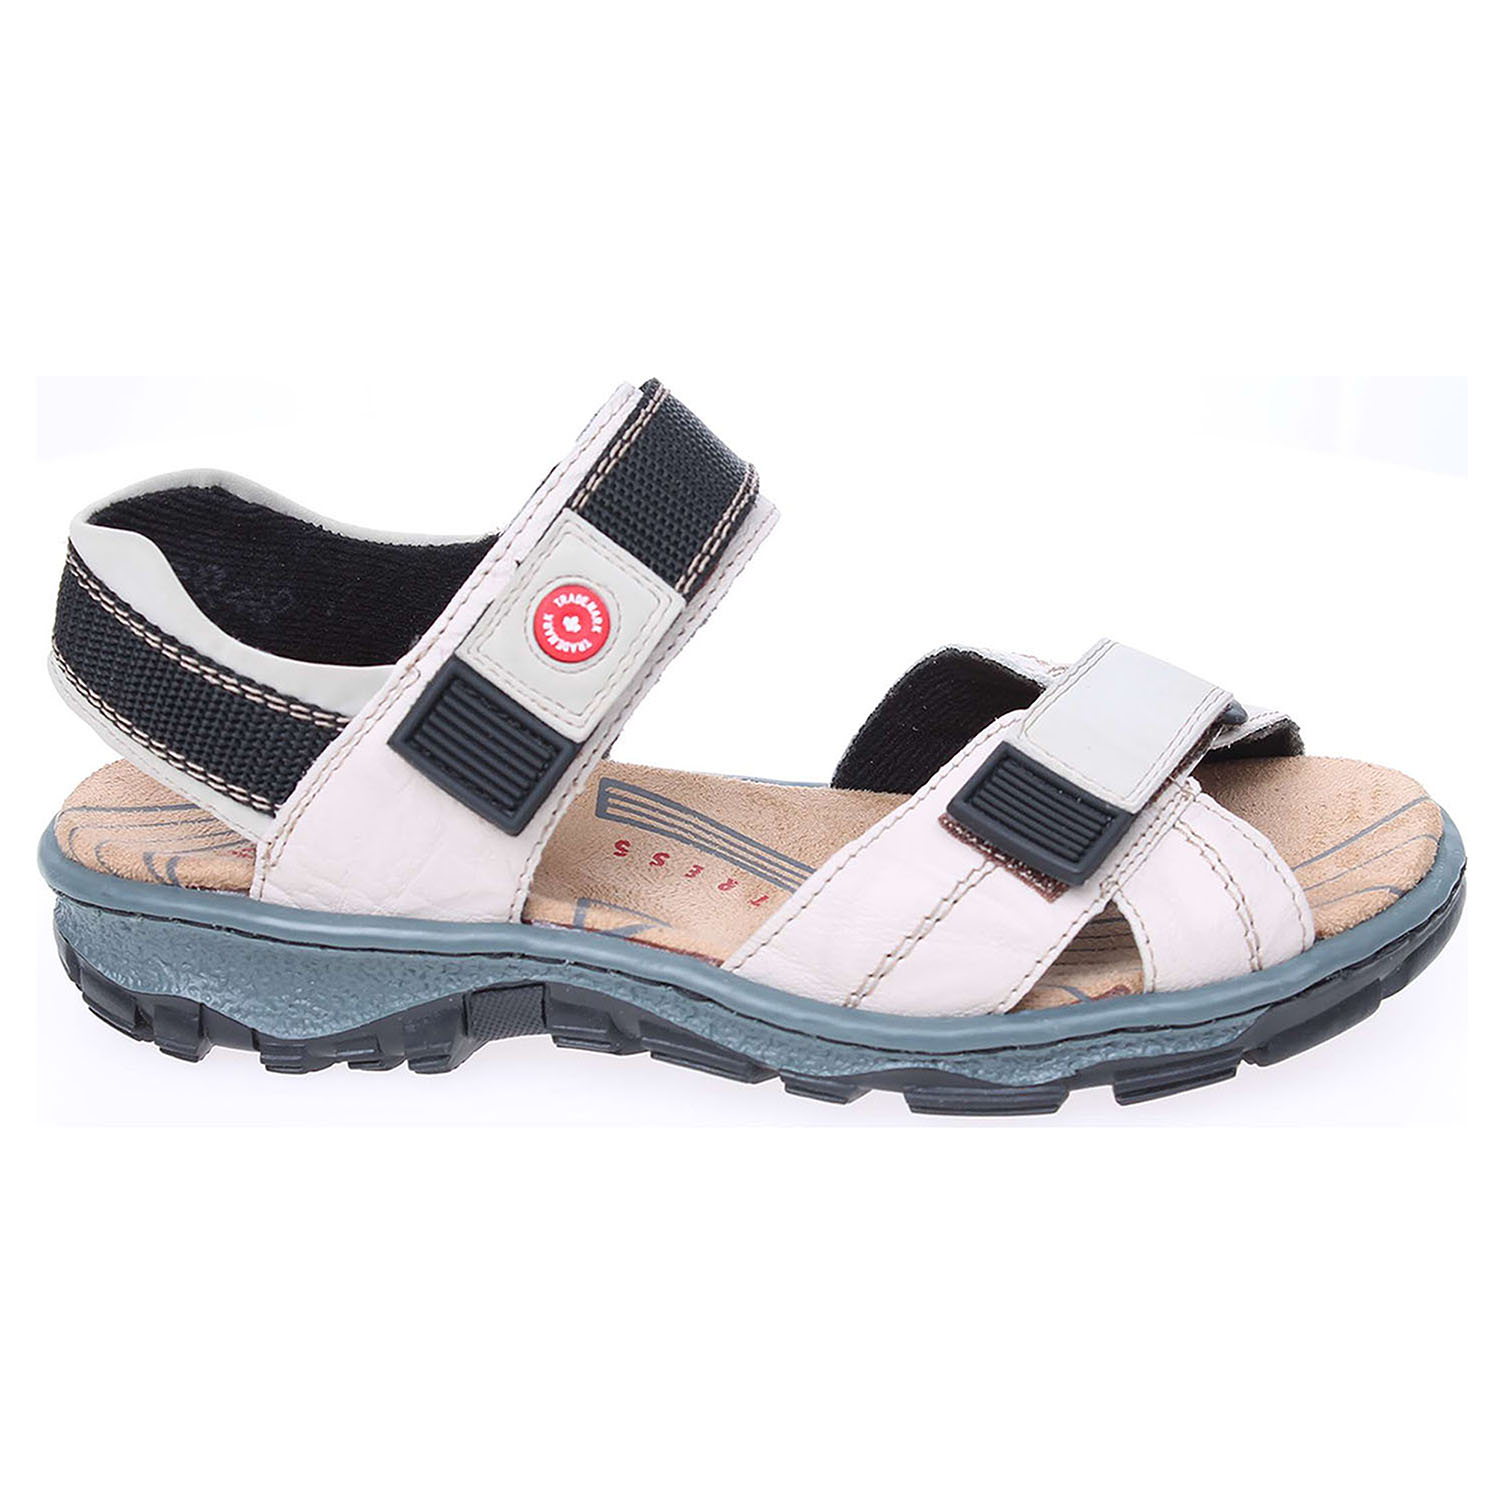 Rieker dámské sandály 68851-60 béžové 38